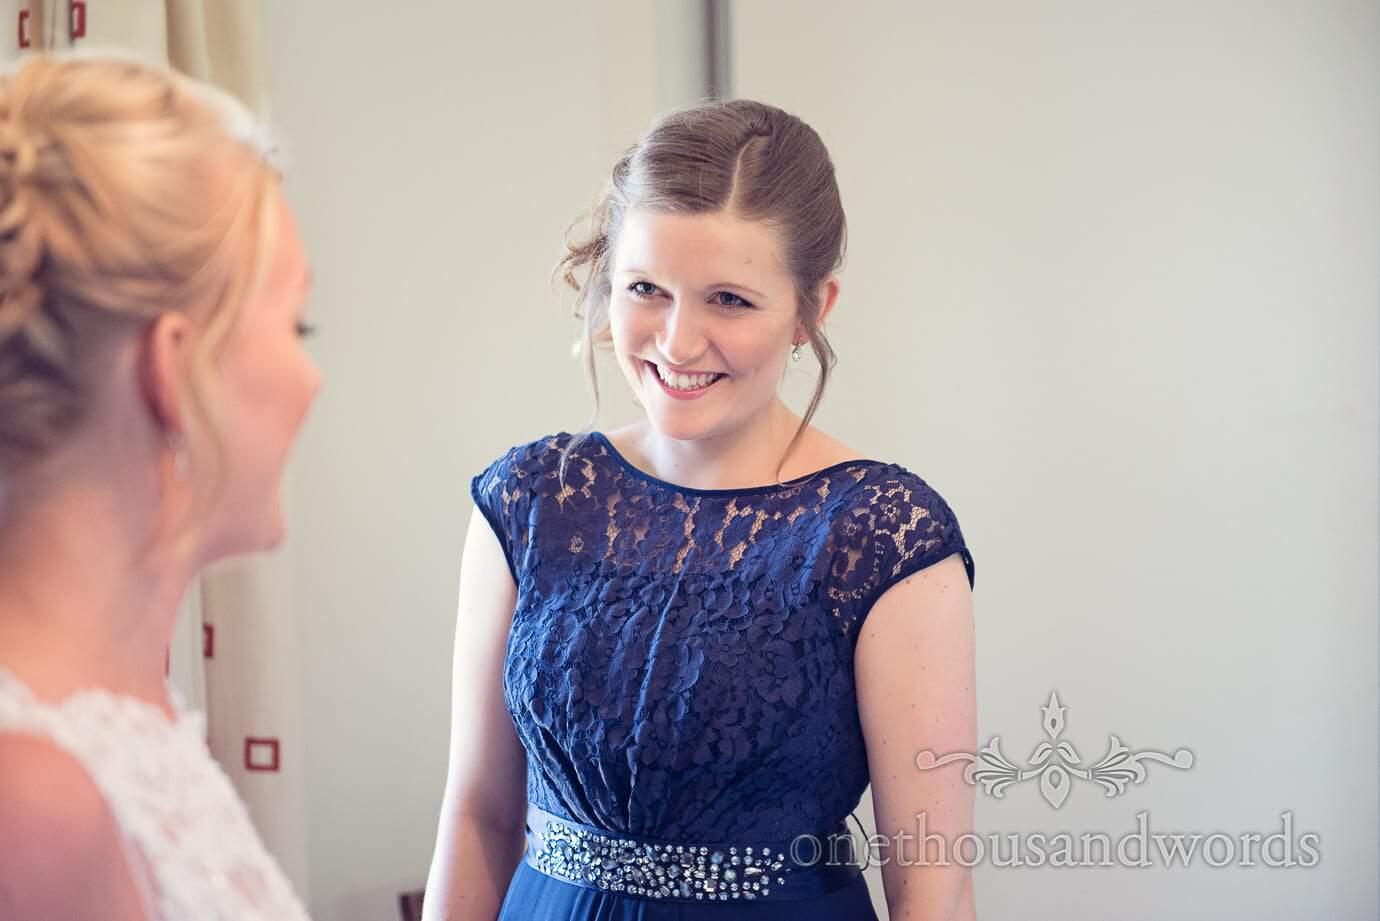 Bridesmaid in blue detailed bridesmaid dress smiles at bride